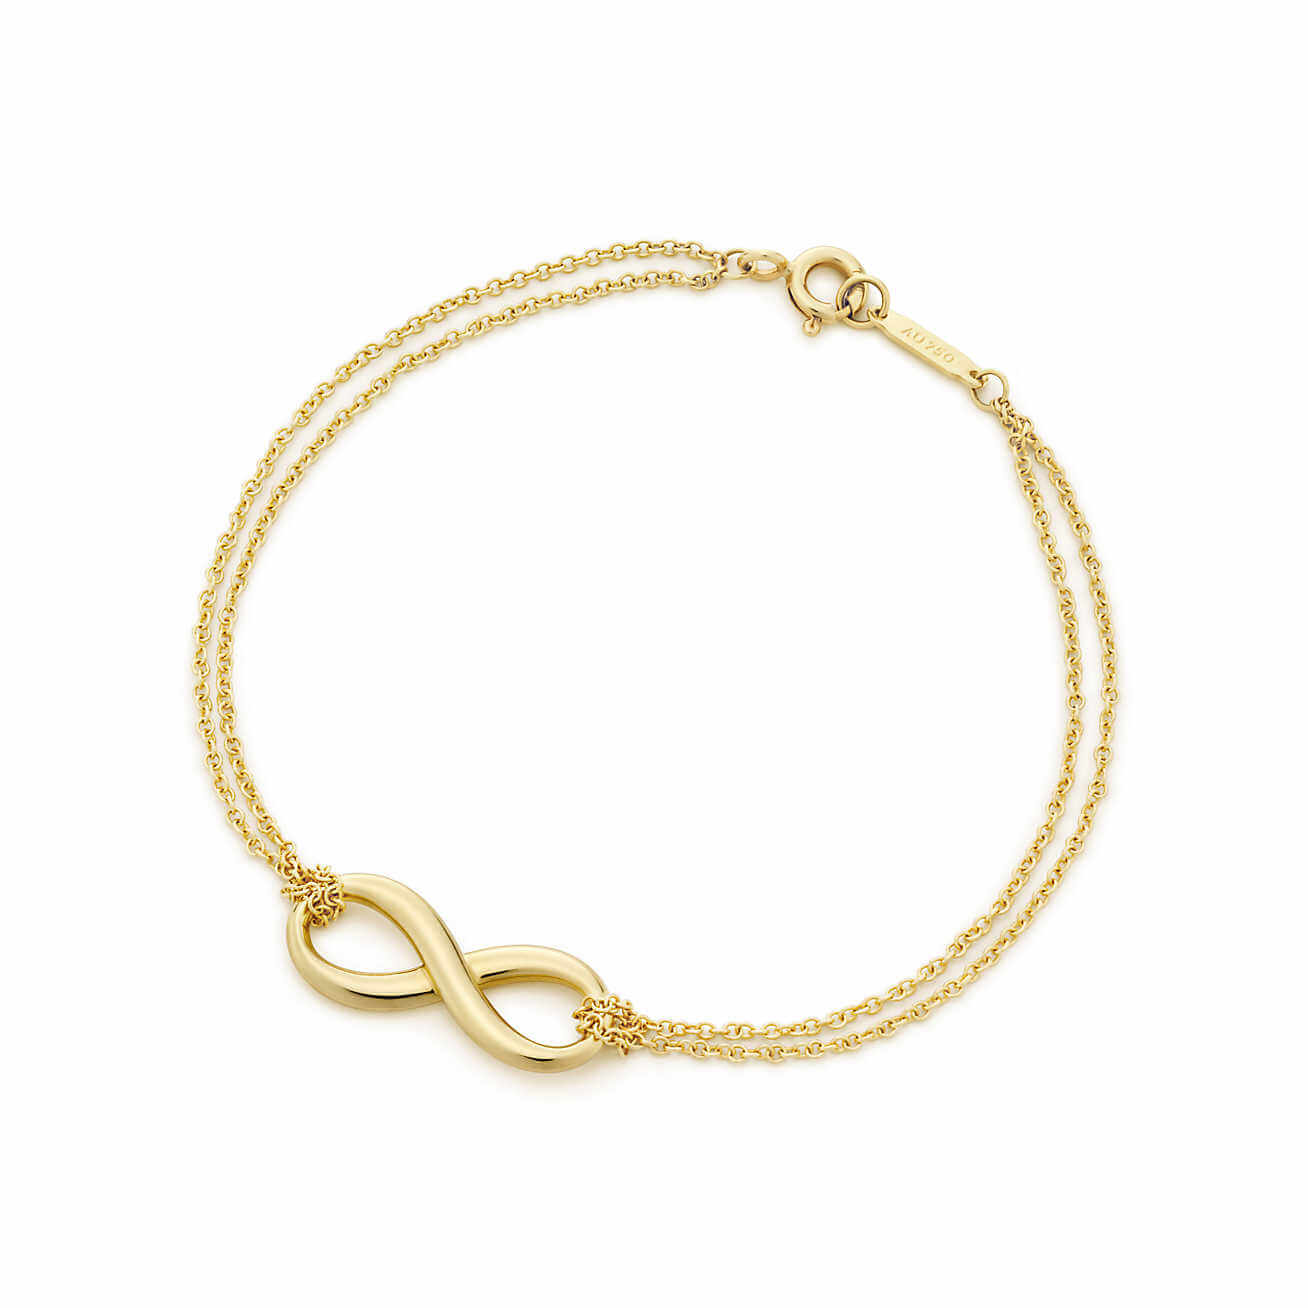 Bracelet Designs Every Man Should Consider Wearing